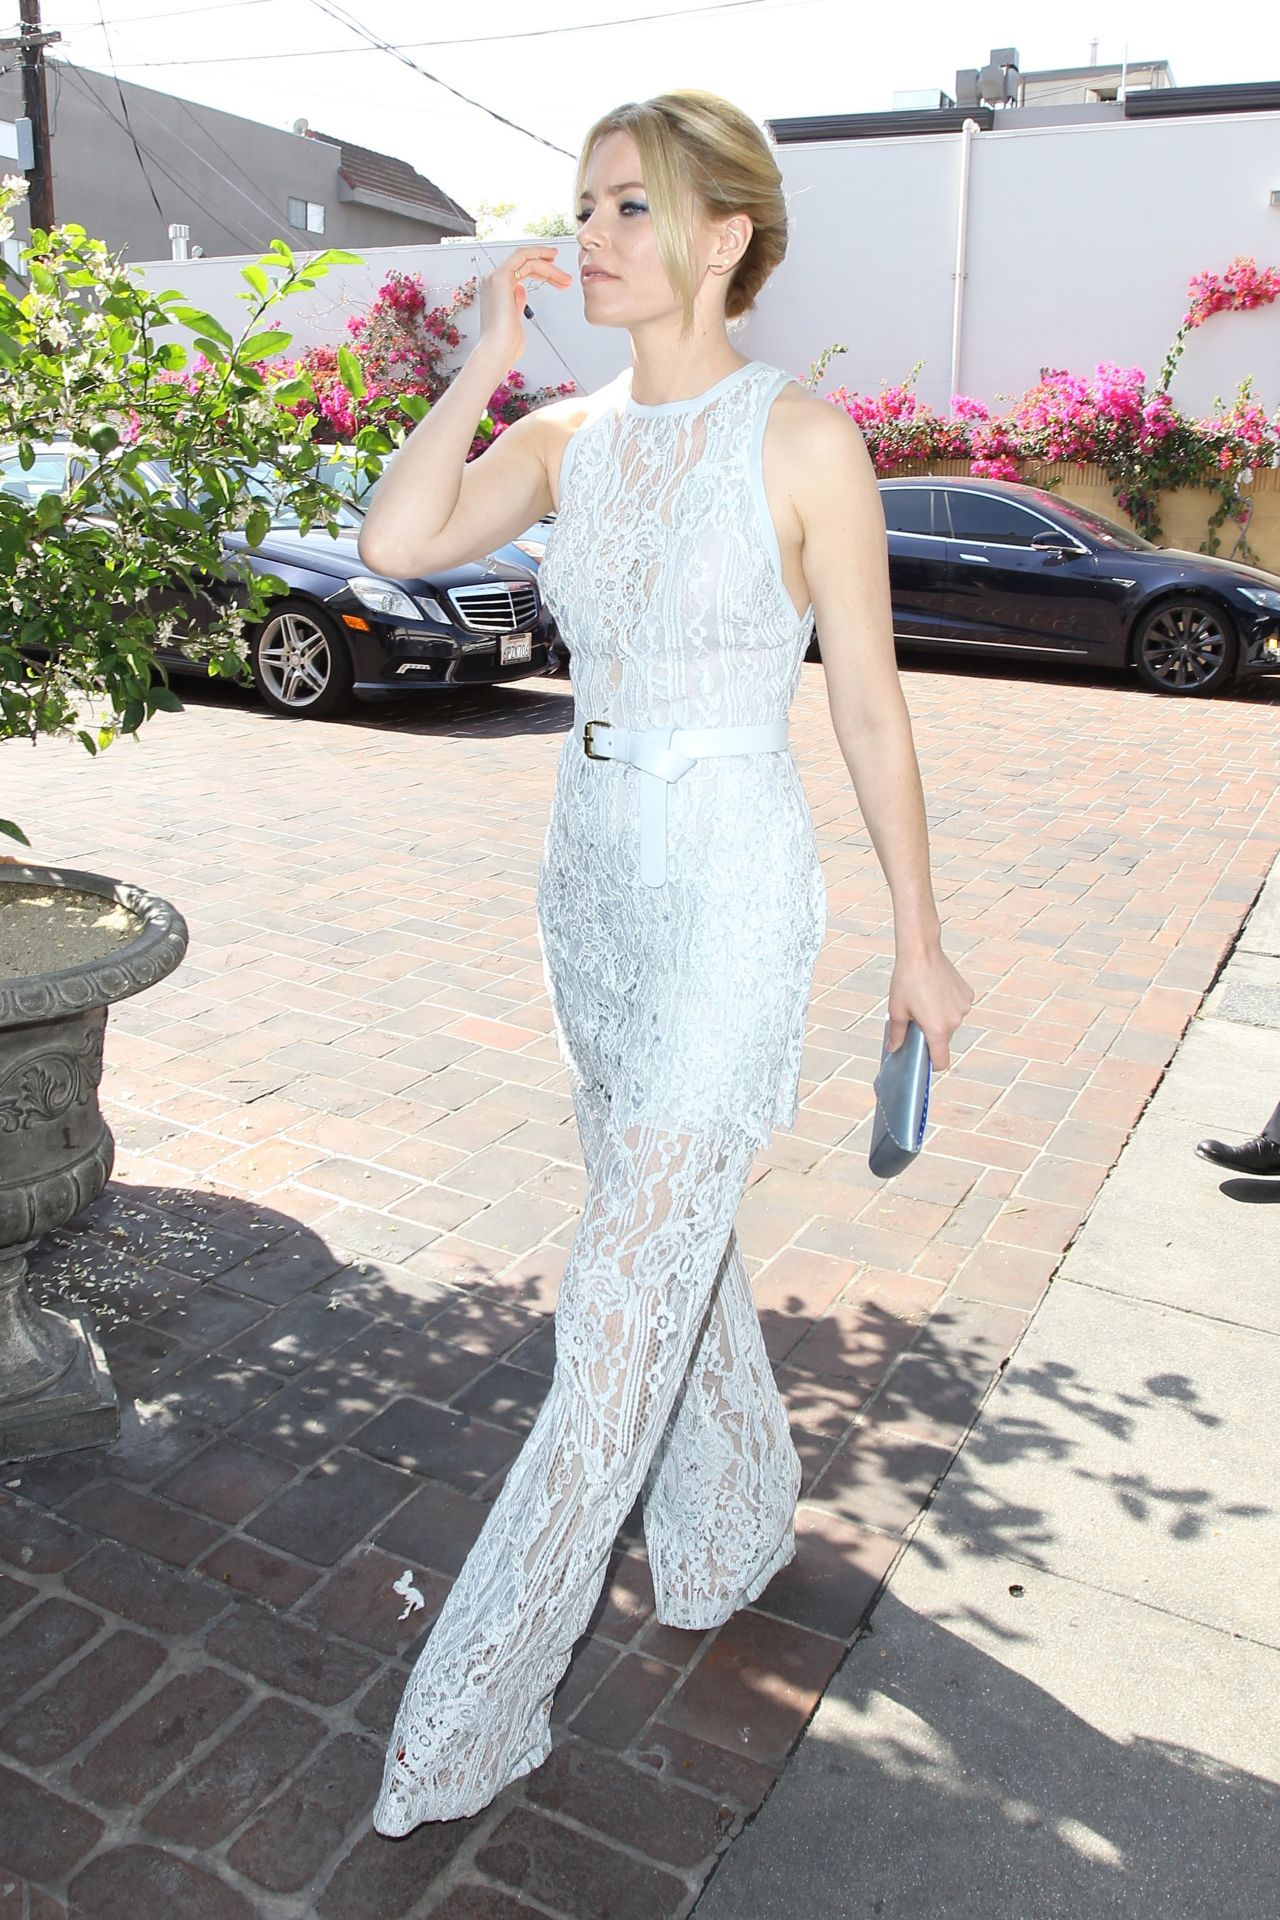 elizabeth-banks-is-looking-all-stylish-vanity-fair-and-stuart-weitzman-luncheon-2-26-2016-6